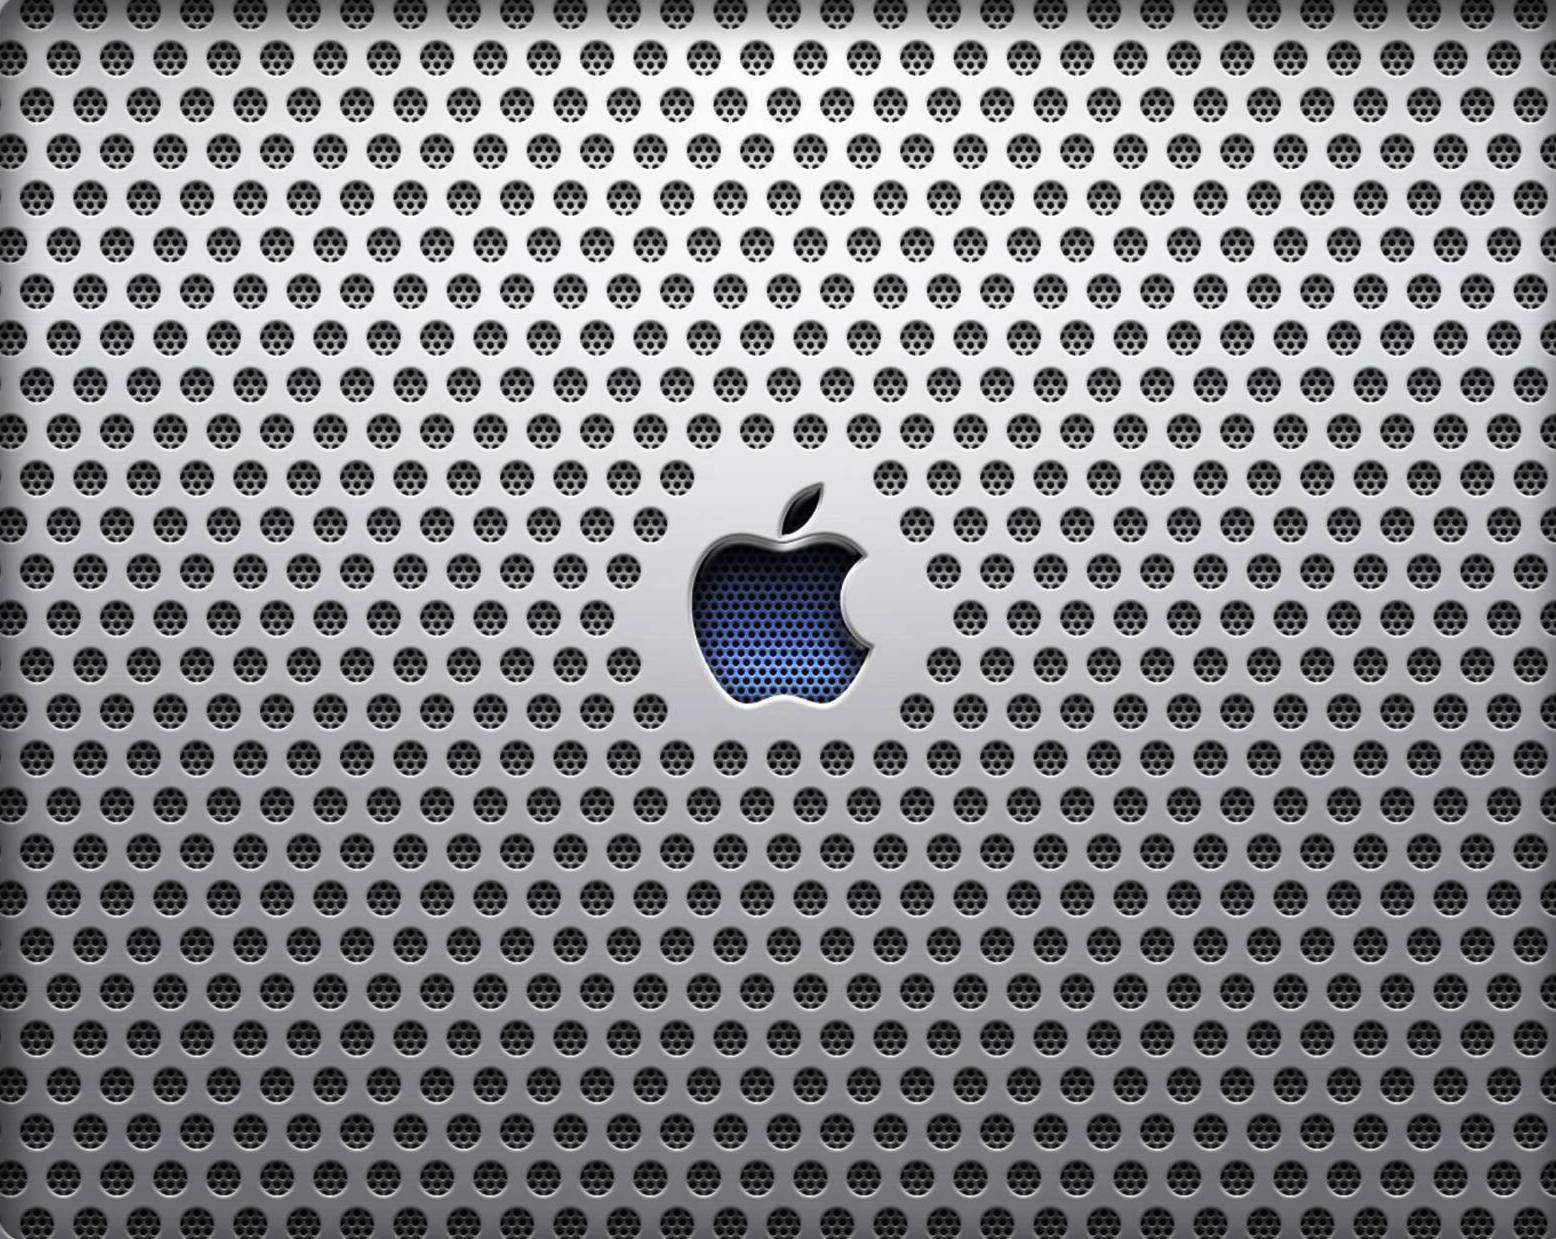 apple aluminum wallpapers - 1556x1239 - 342407